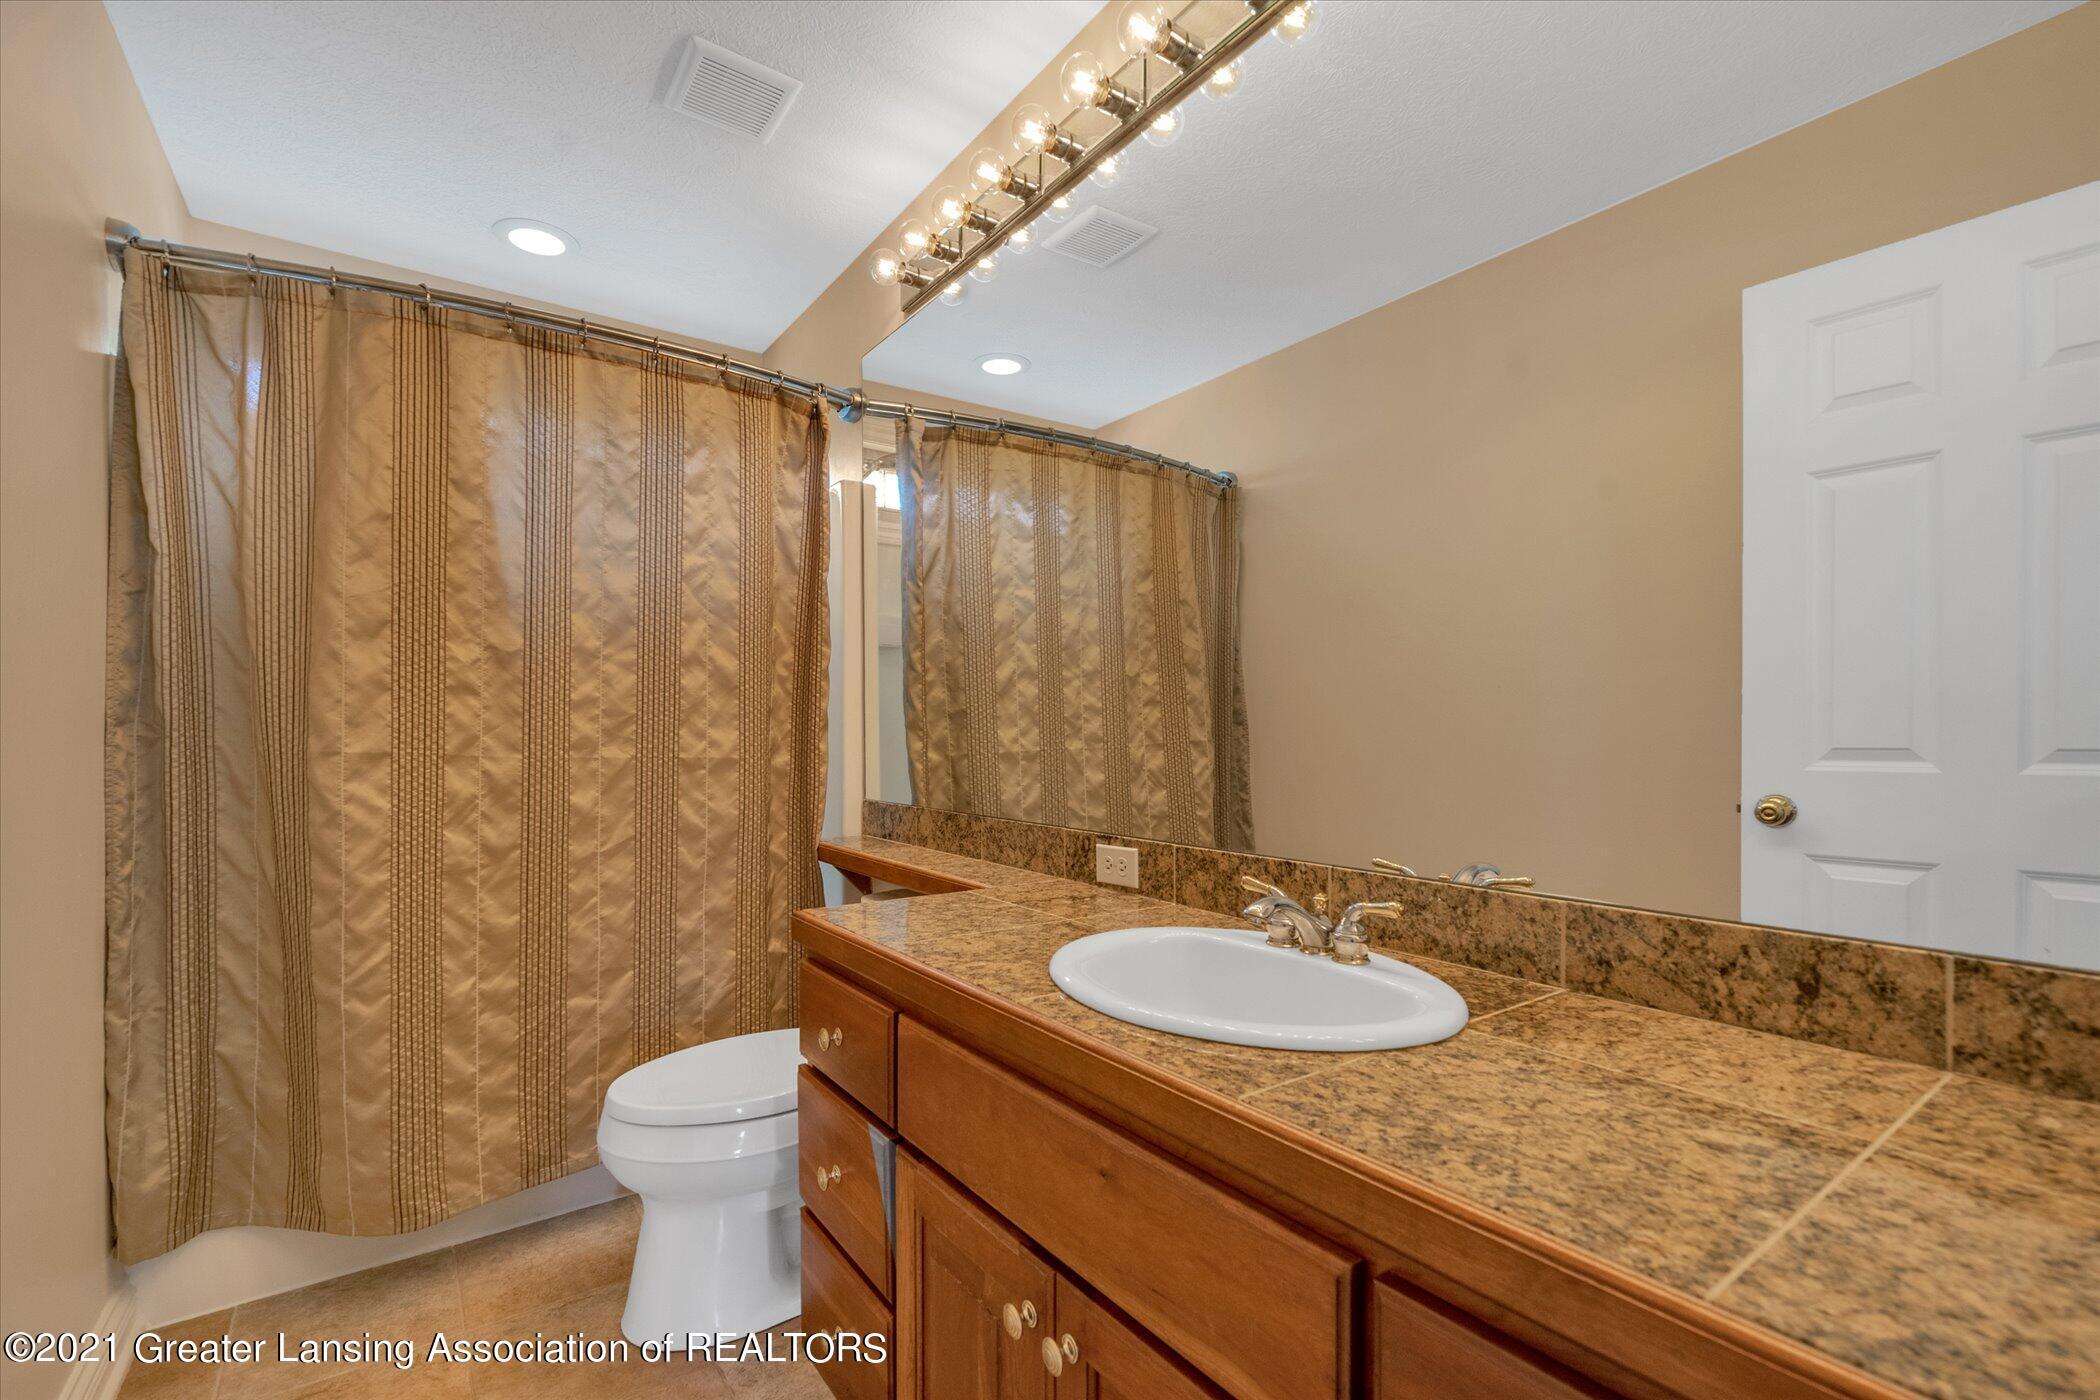 8100 Casandra Ln - UPPER LEVEL Full Bathroom - 30